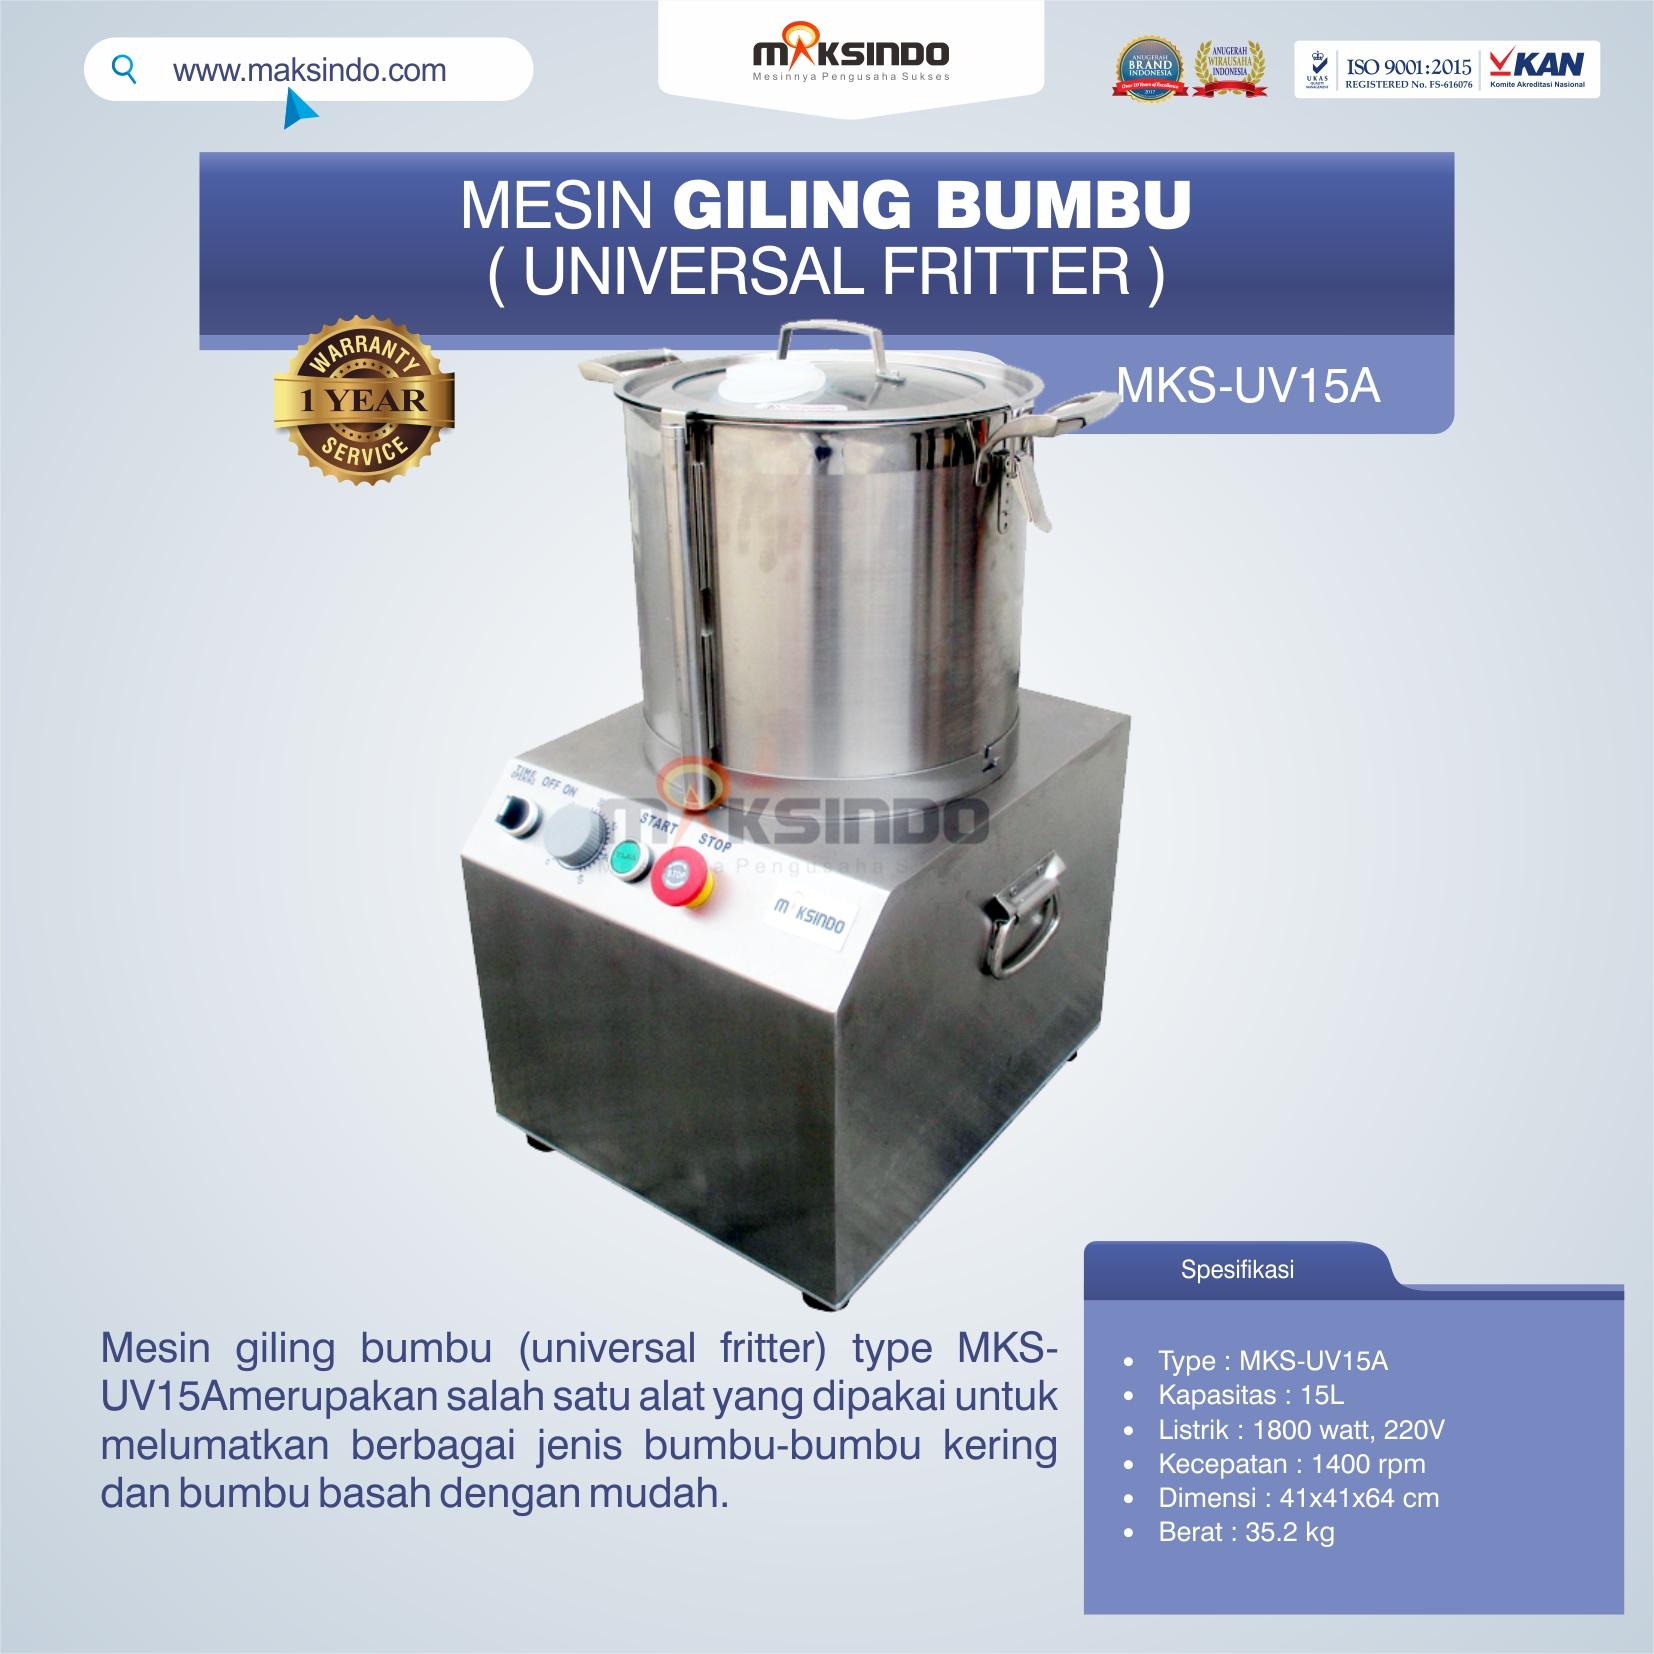 Jual Mesin Giling Bumbu (Universal Fritter) MKS-UV15A di Palembang